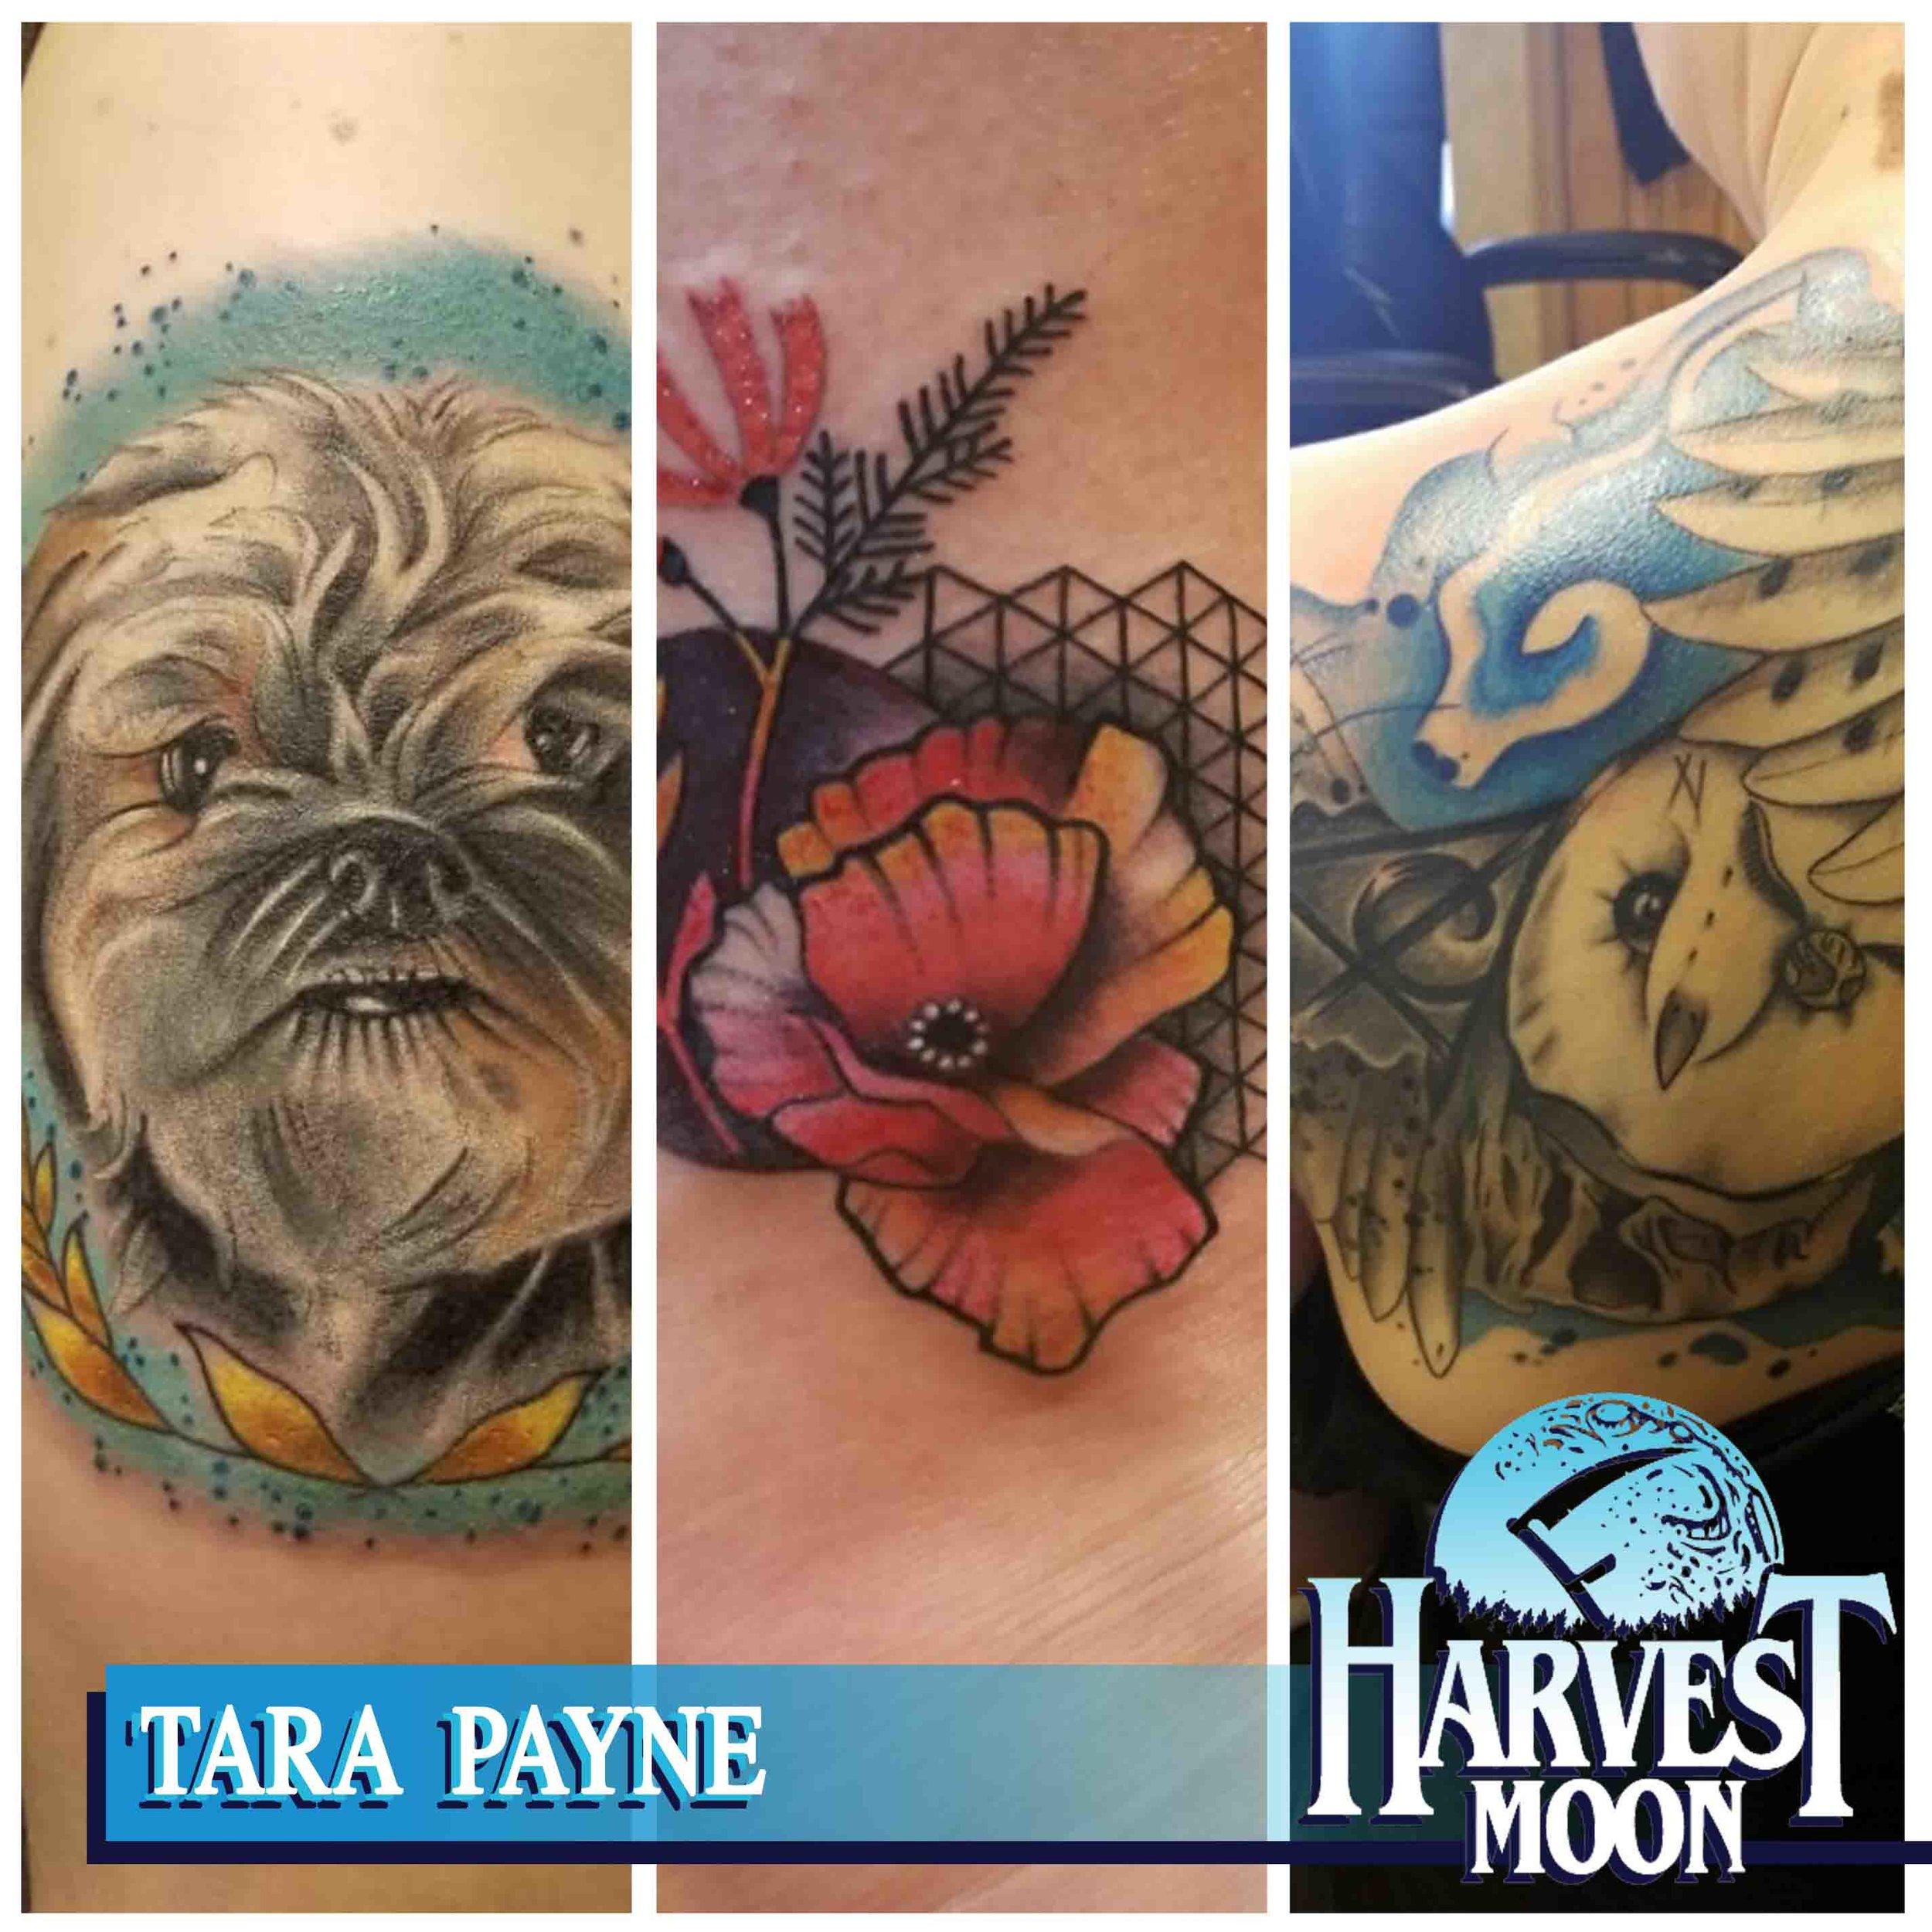 Lost Lakes Tattoo Madison, WI